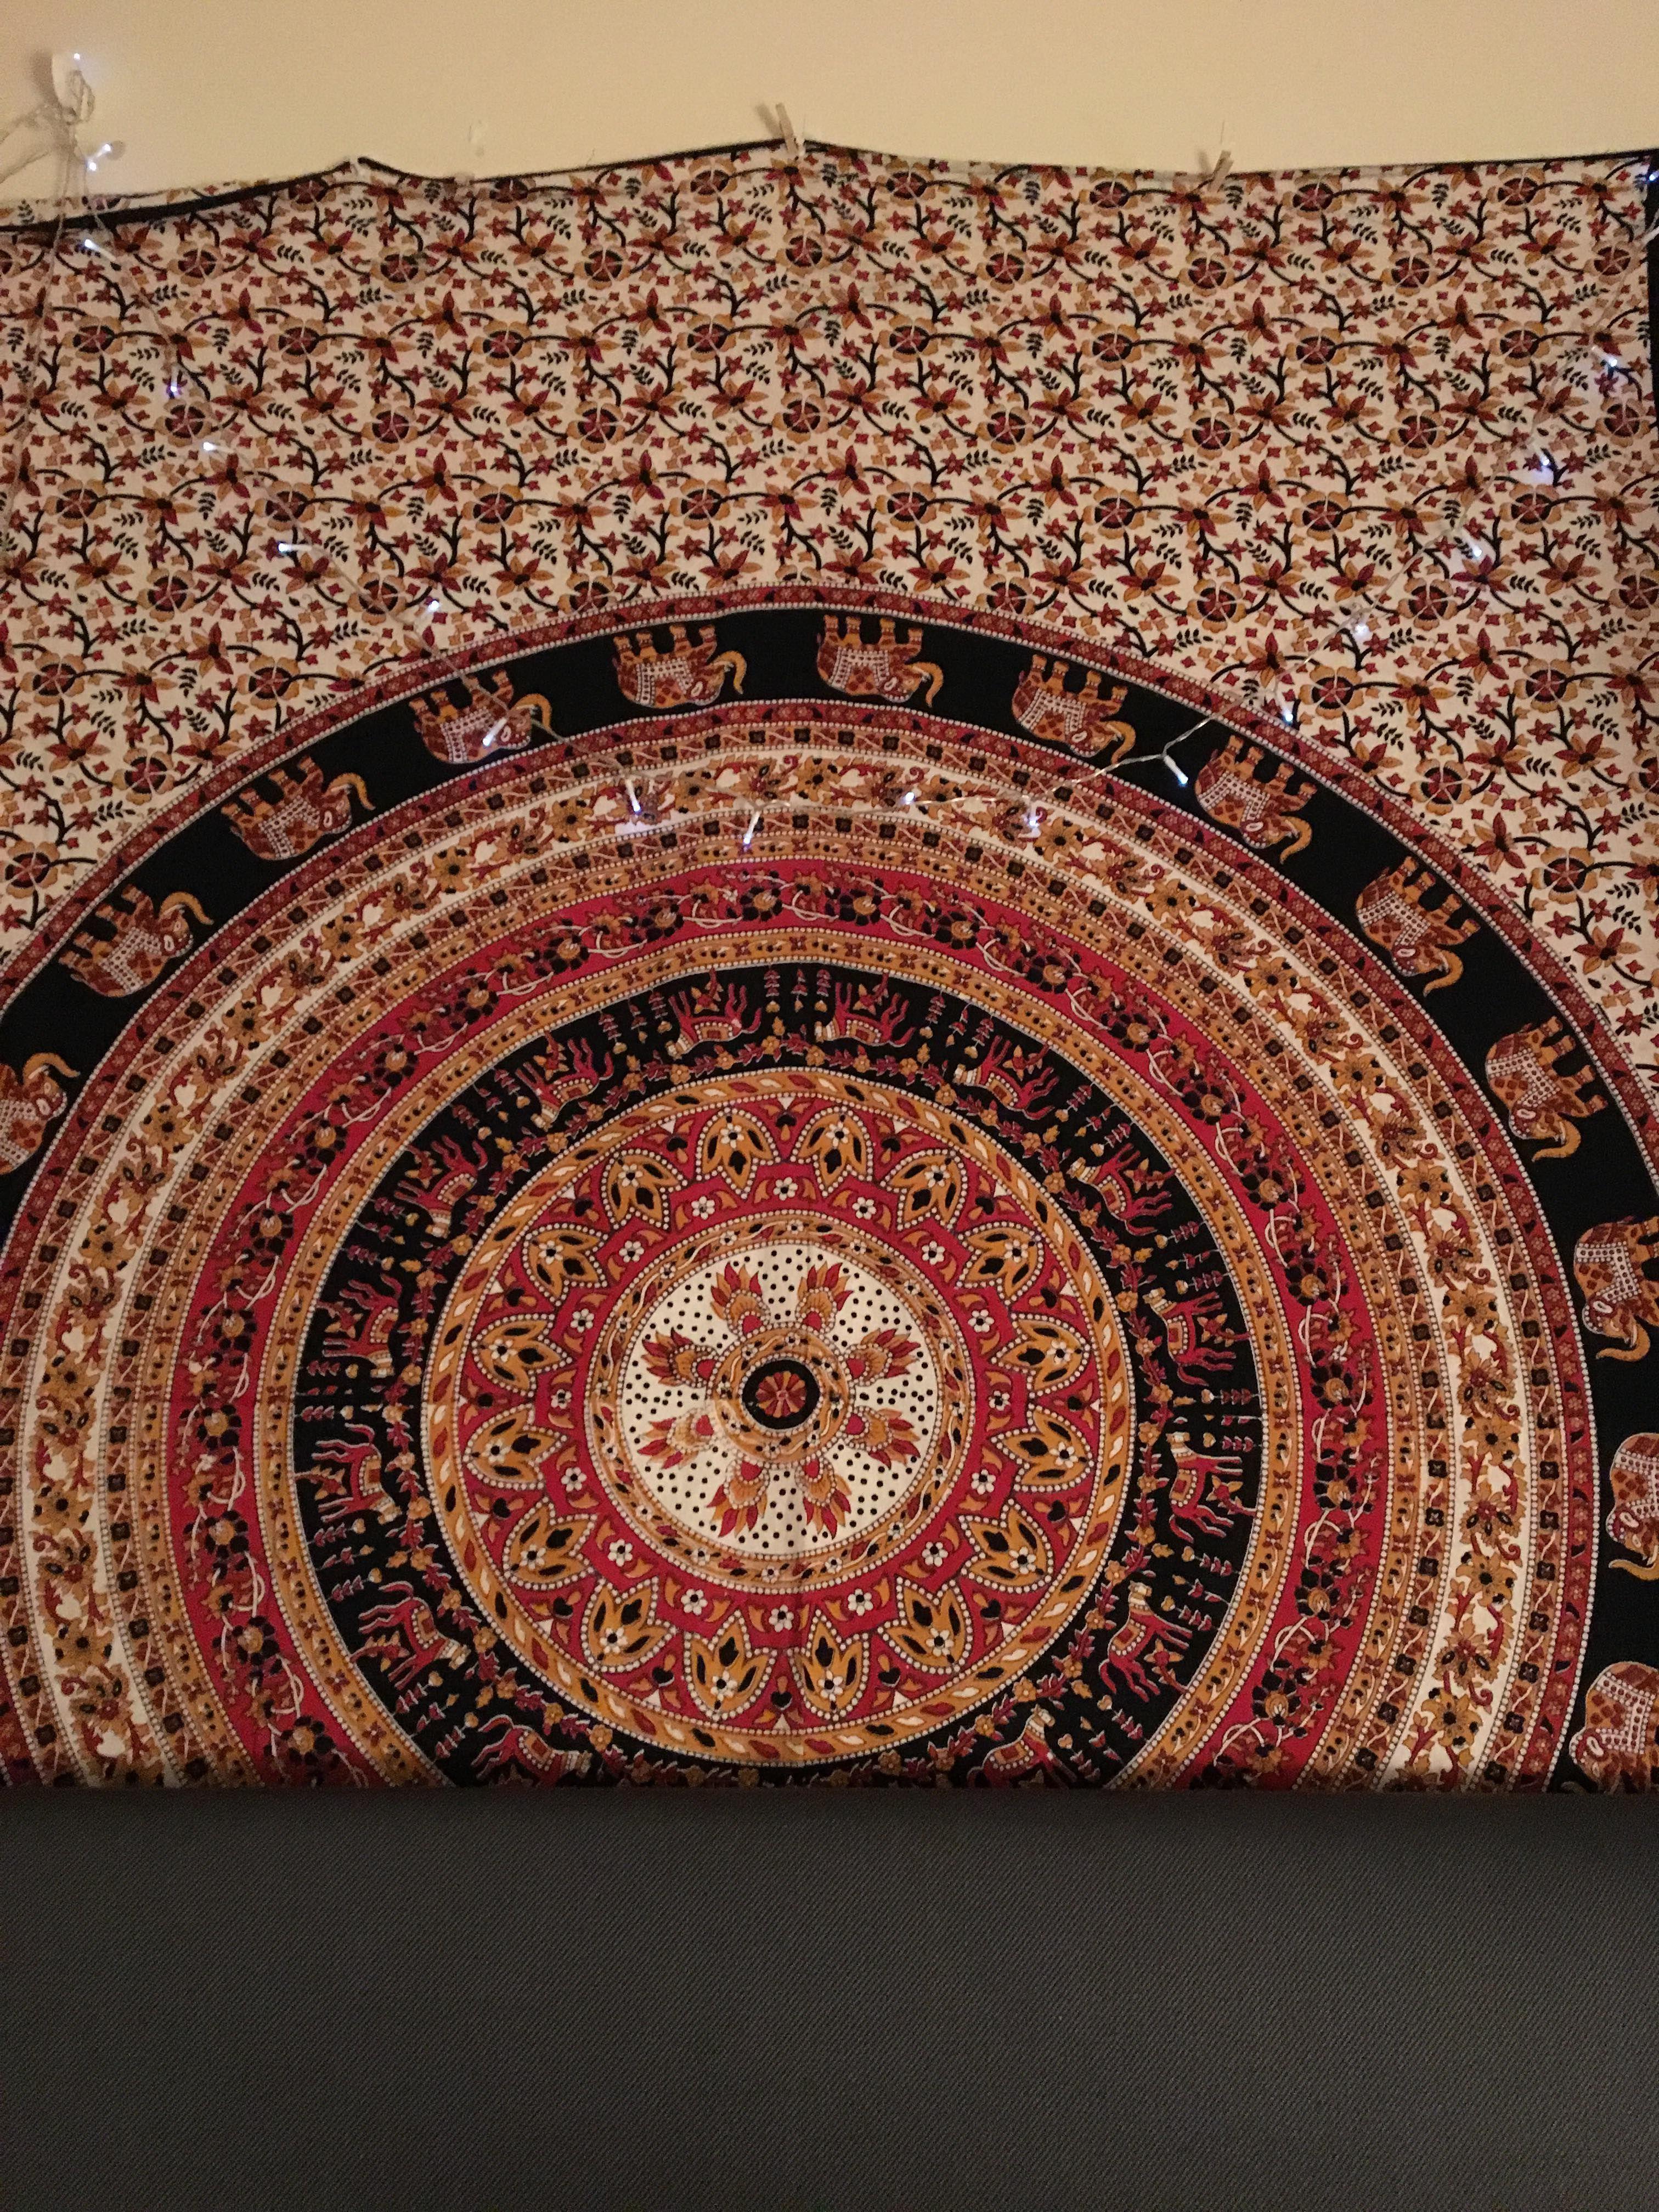 Image may contain: Woven, Home Decor, Carpet